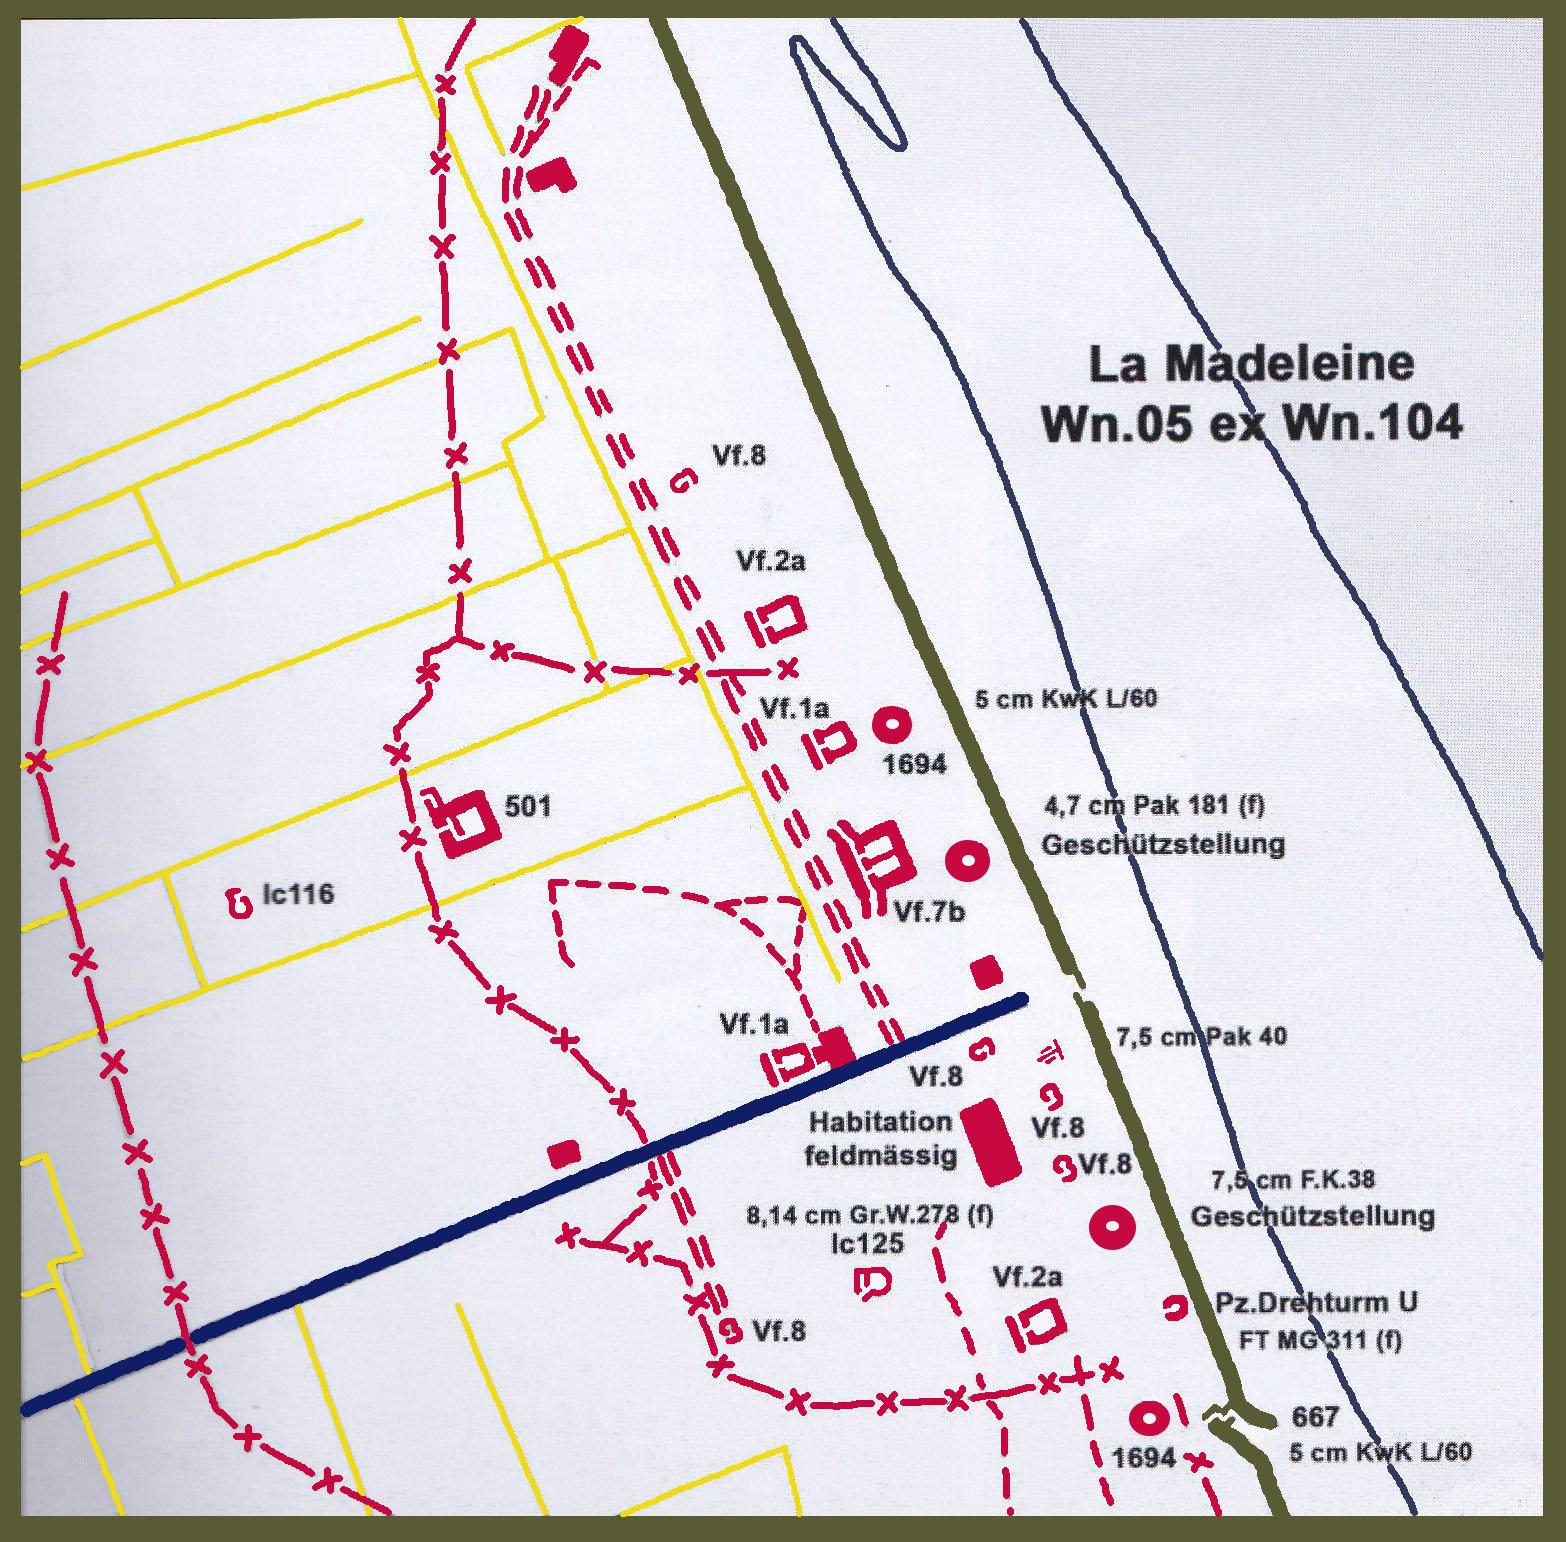 La Madeleine WN05